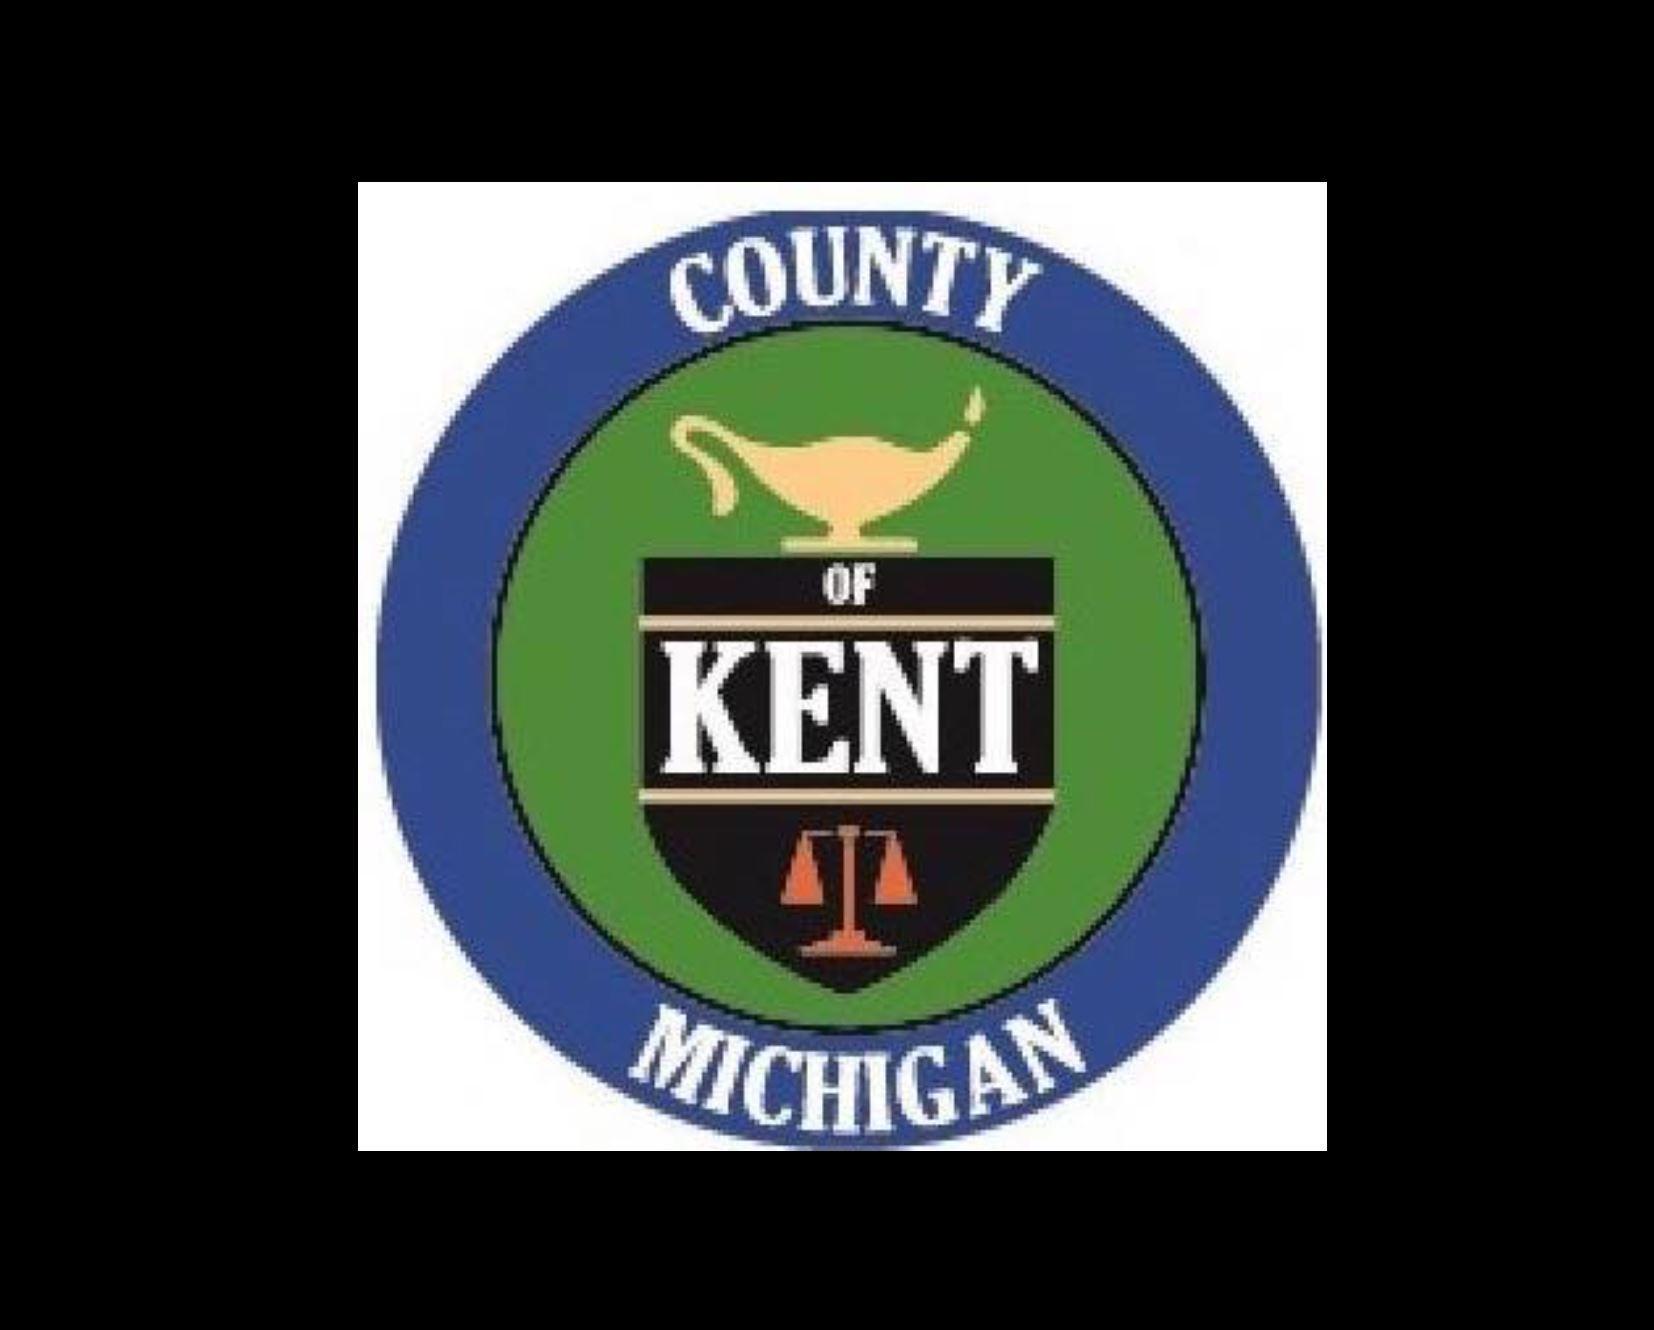 Condado de Kent (Foto: Kent County Michigan Facebook)